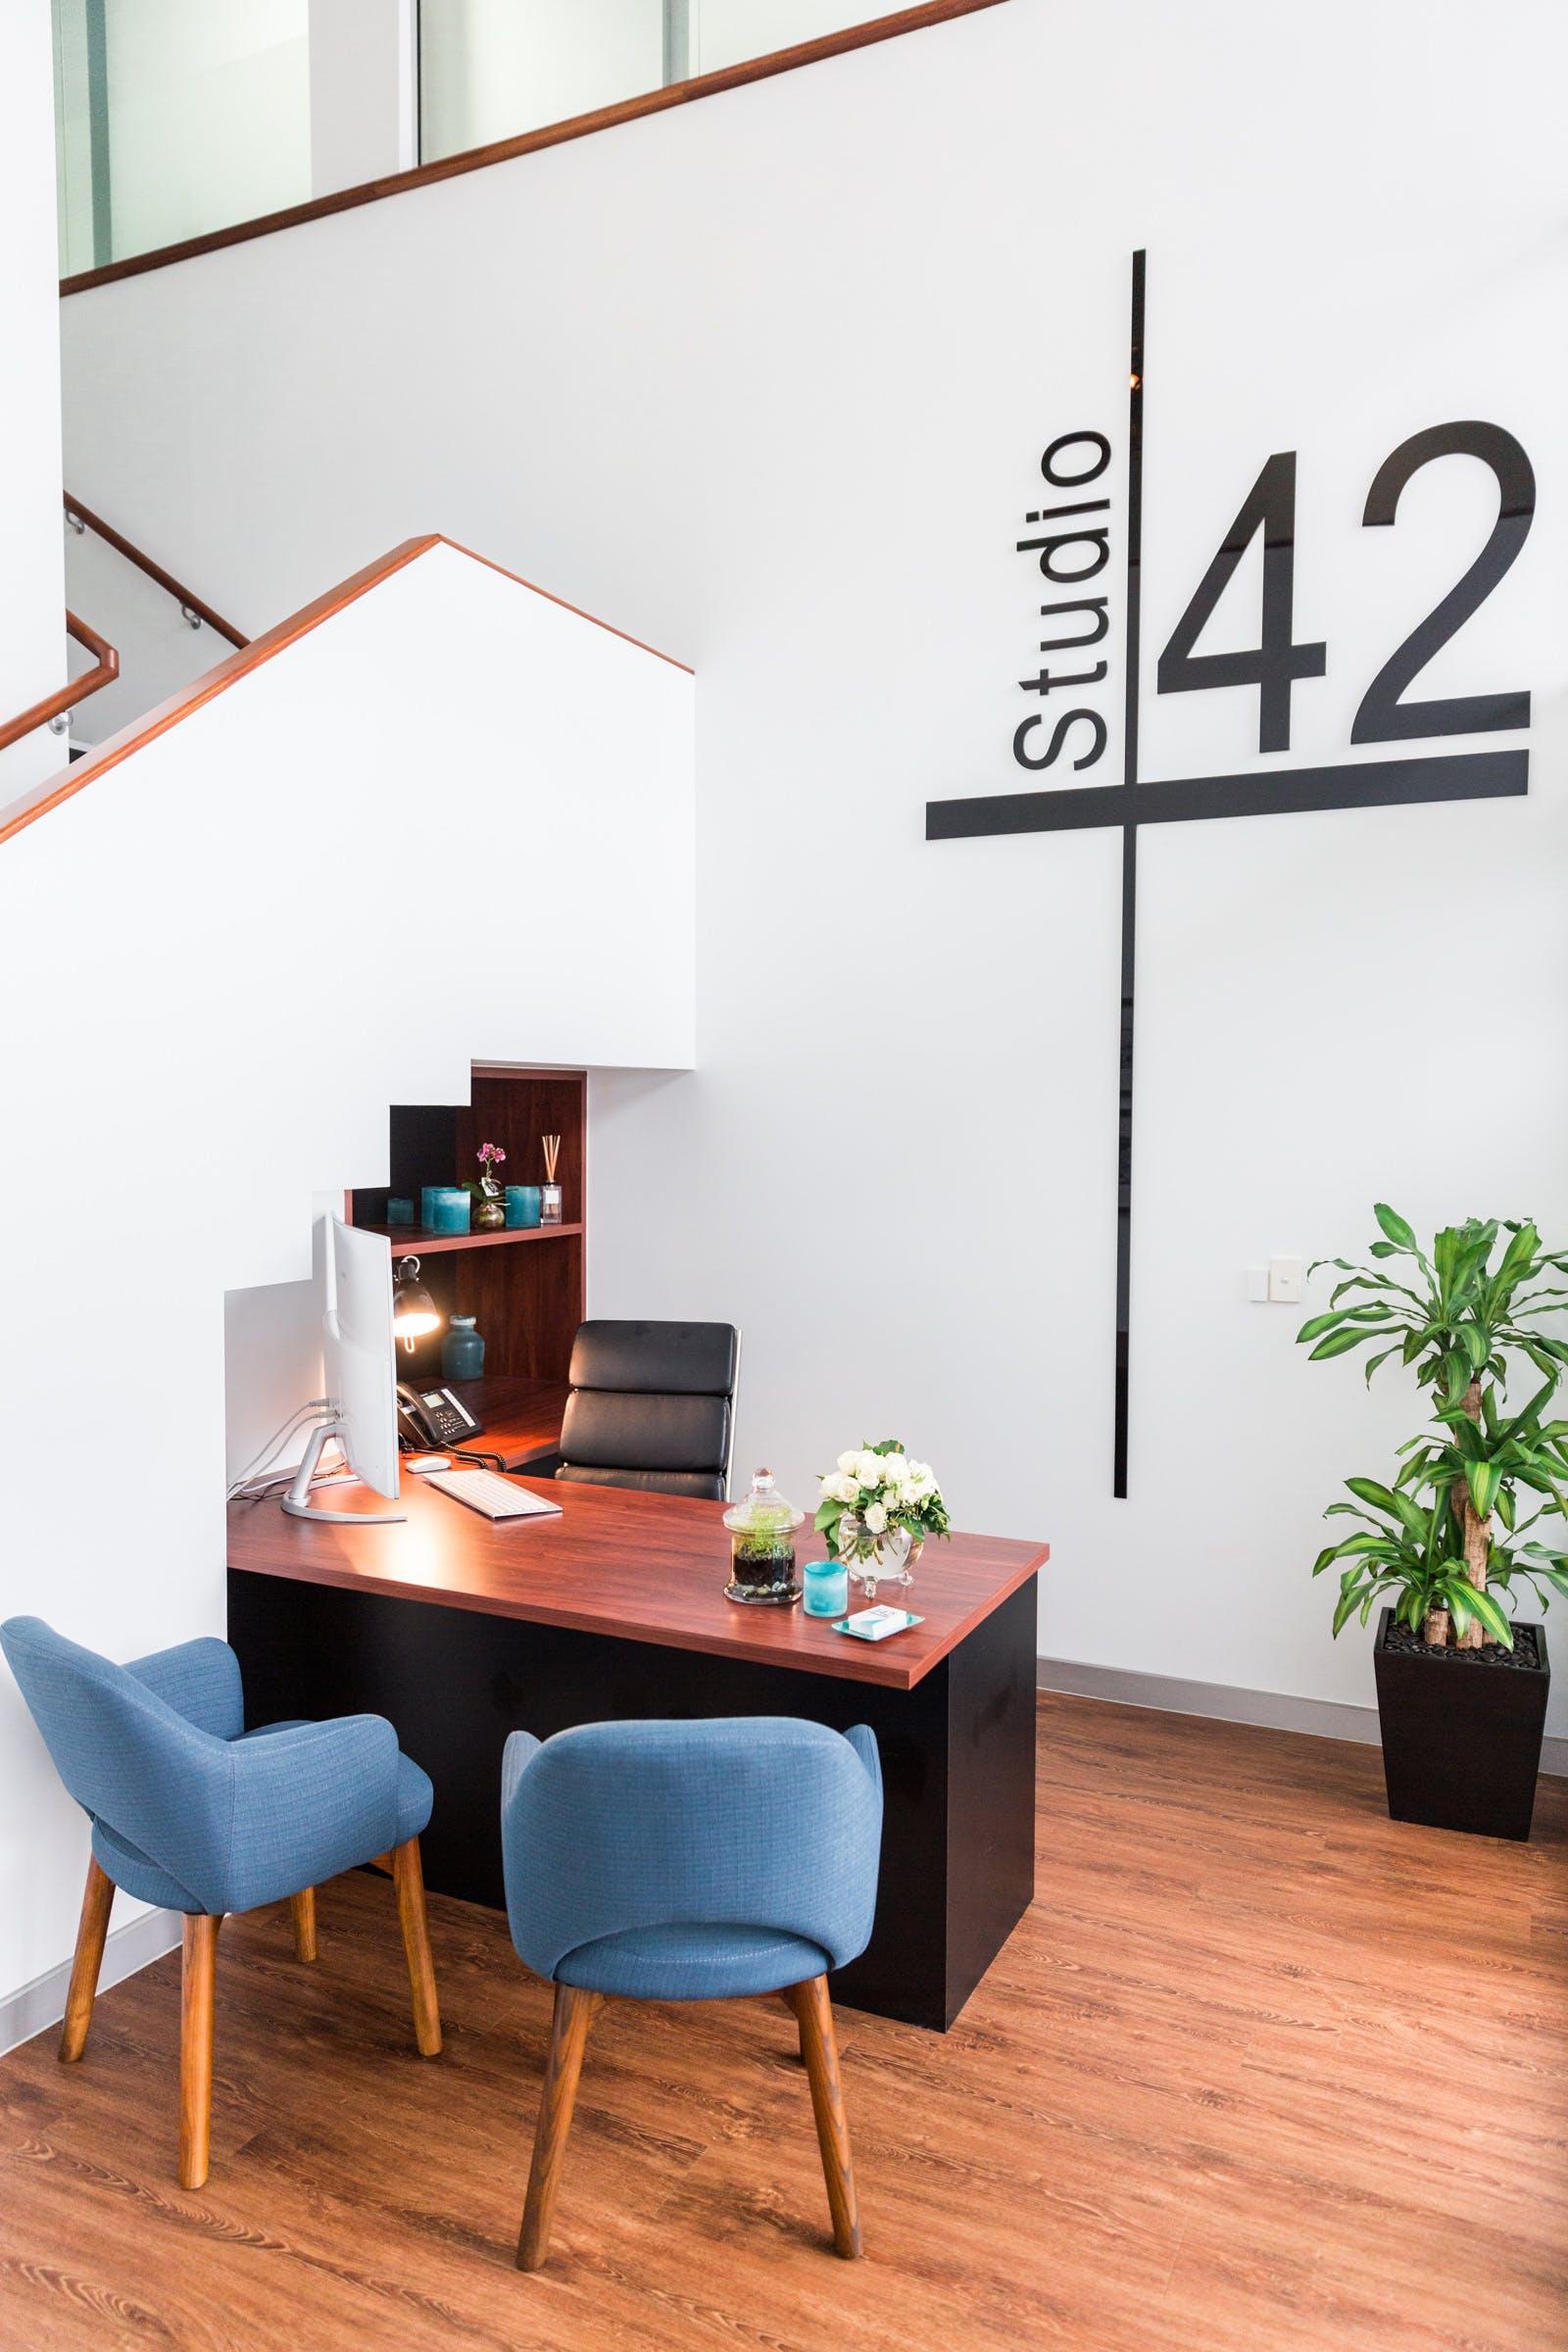 Meeting Room for 4 people, meeting room at Studio42, image 2